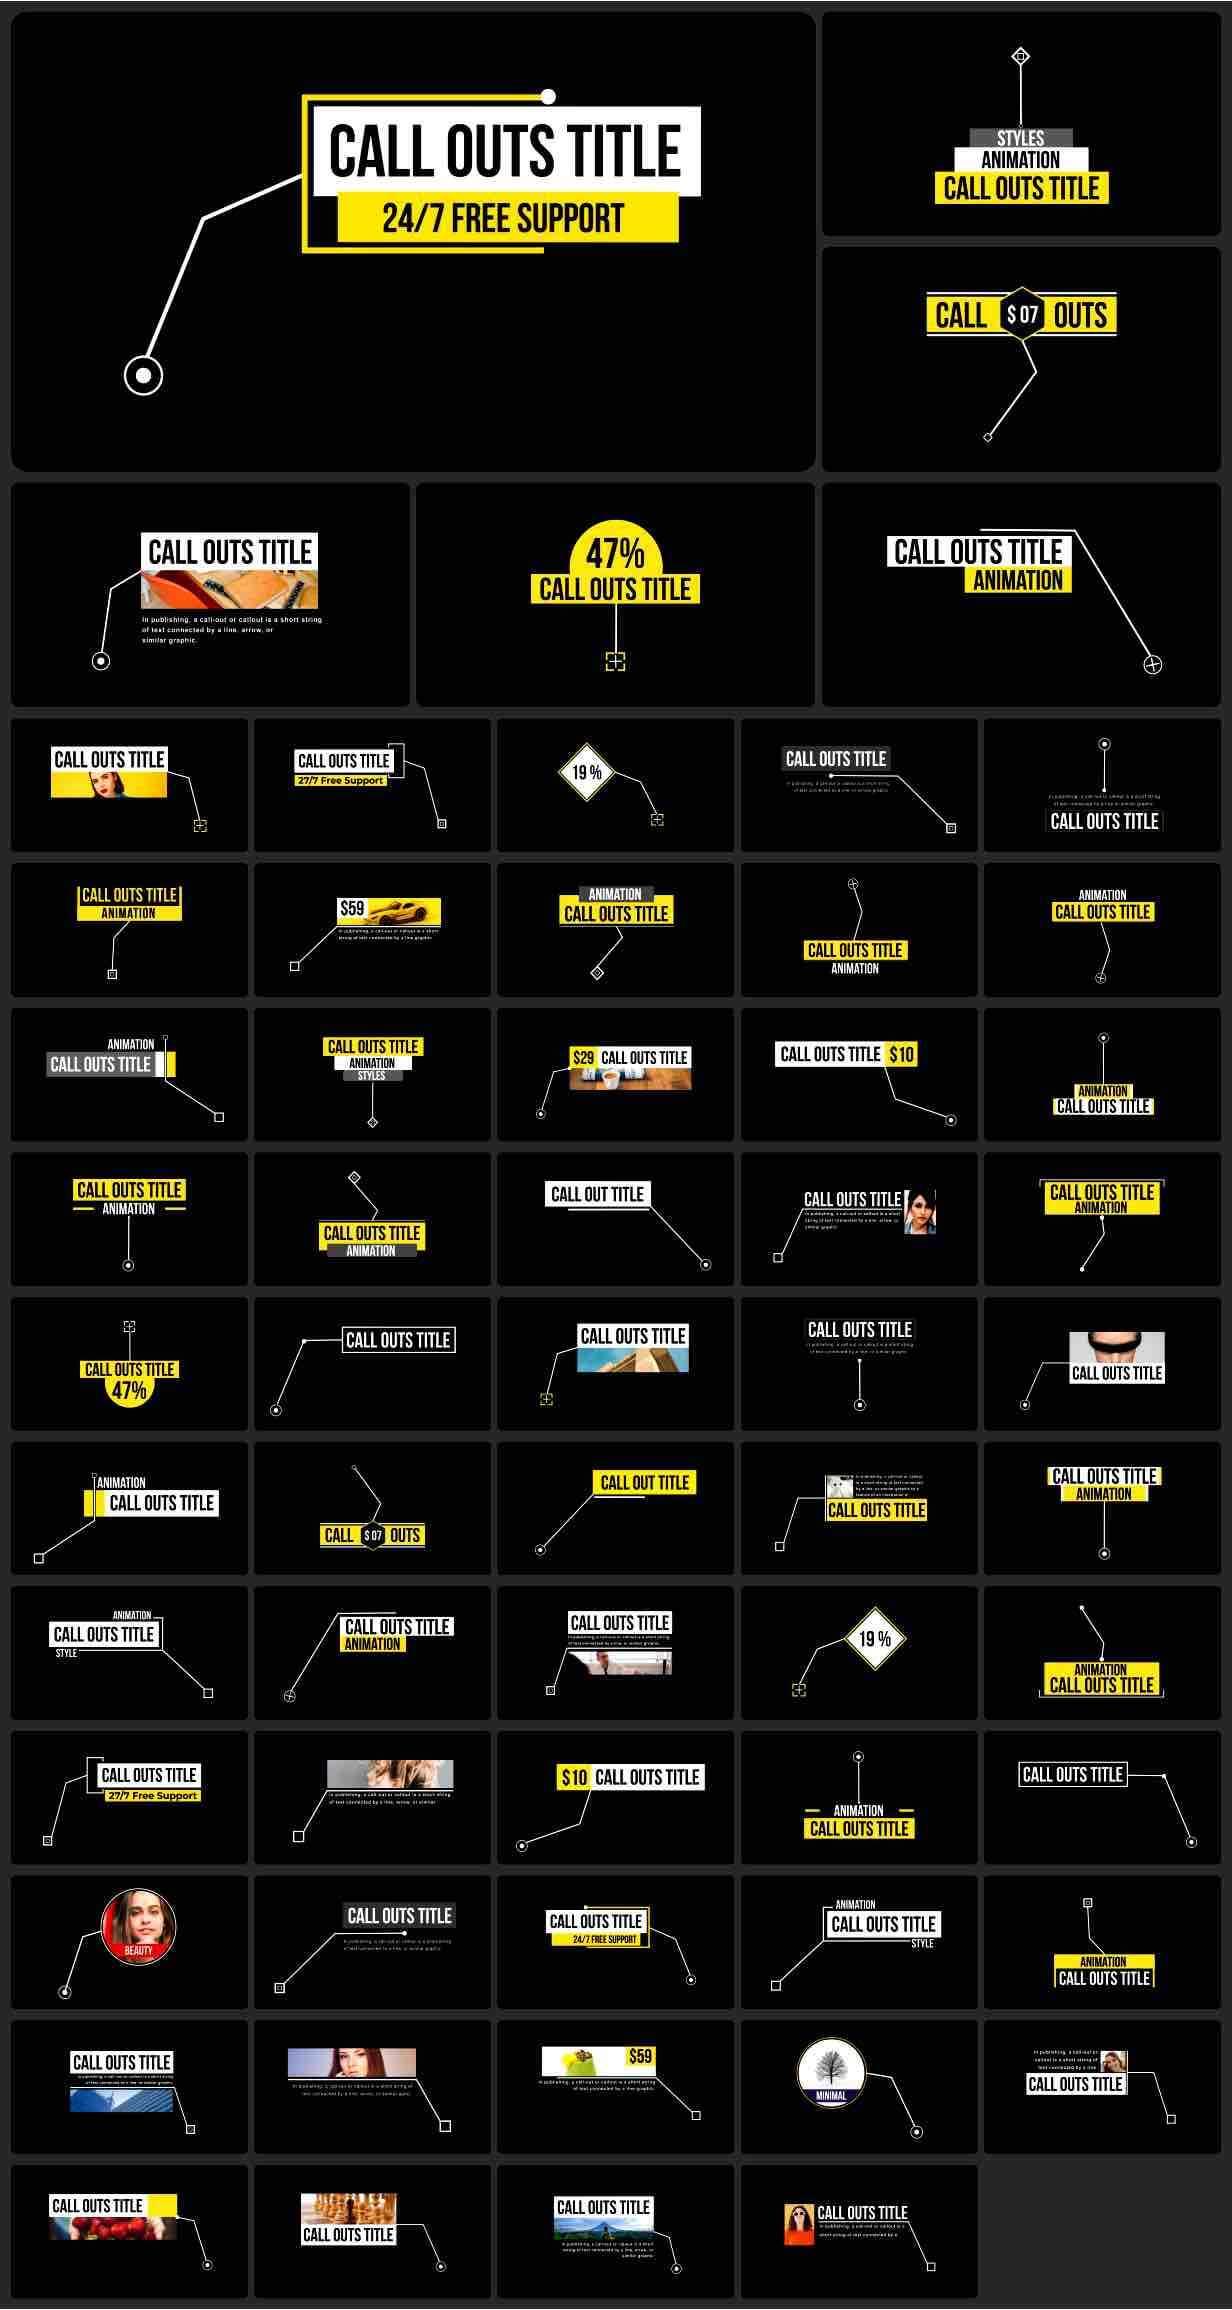 AE模板-2200+效果工具图形库 Graphics Pack插图13